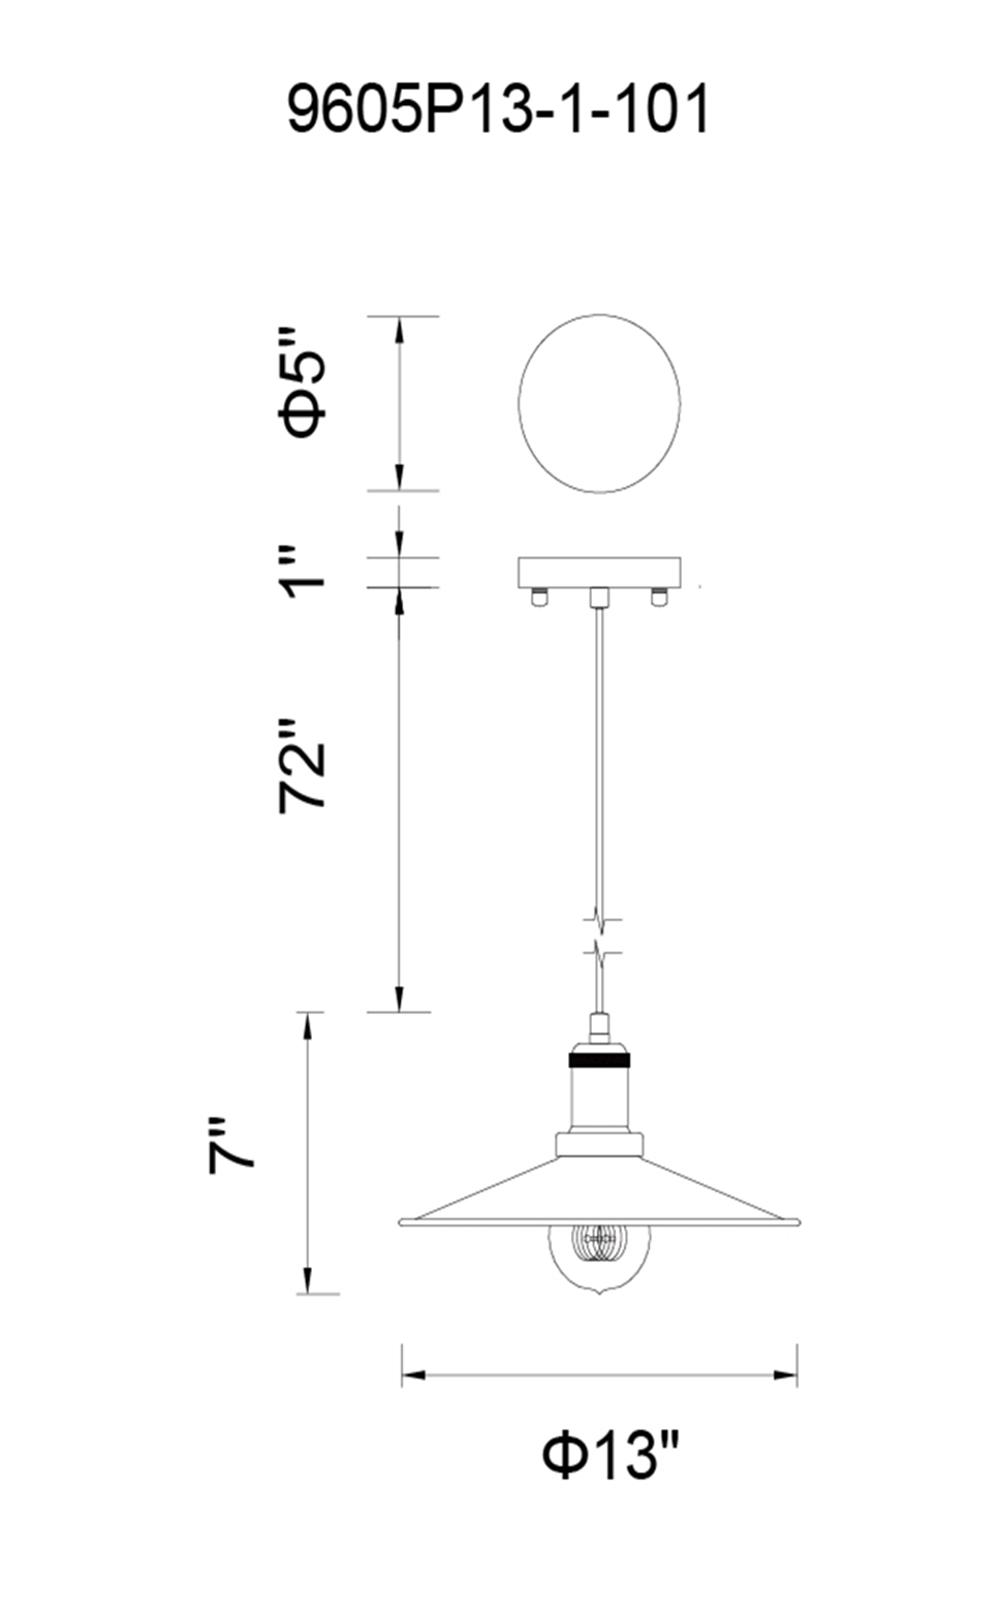 CWI Lighting Brave 1 Light Down Mini Pendant With Black Finish Model: 9605P13-1-101 Line Drawing